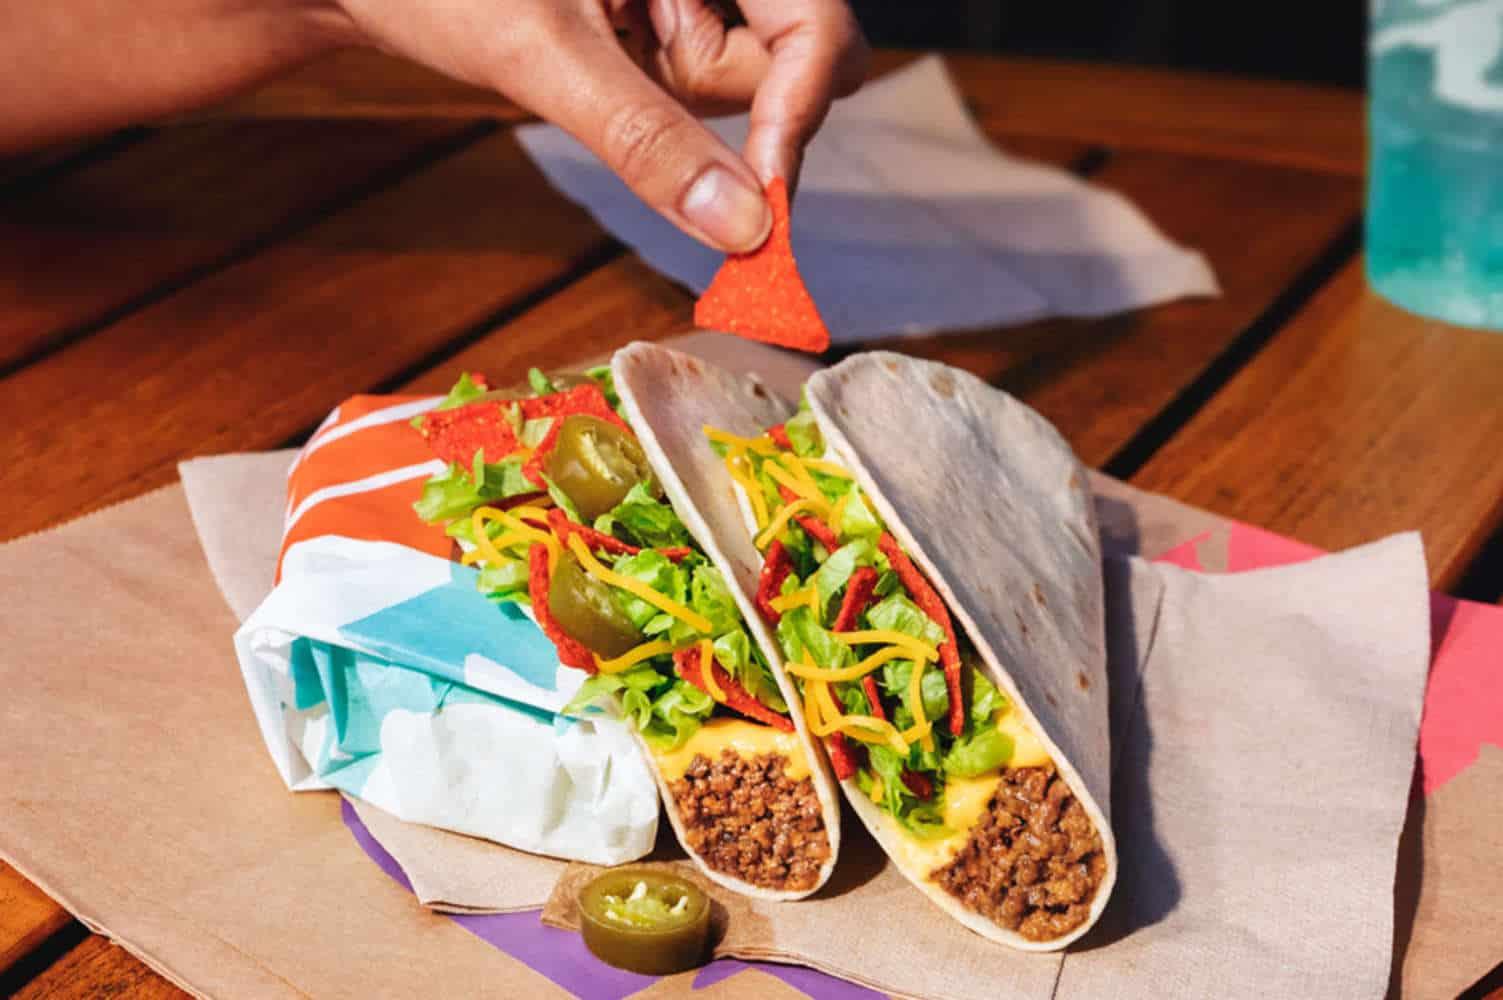 The $1 Loaded Nacho Taco Returns To Taco Bell